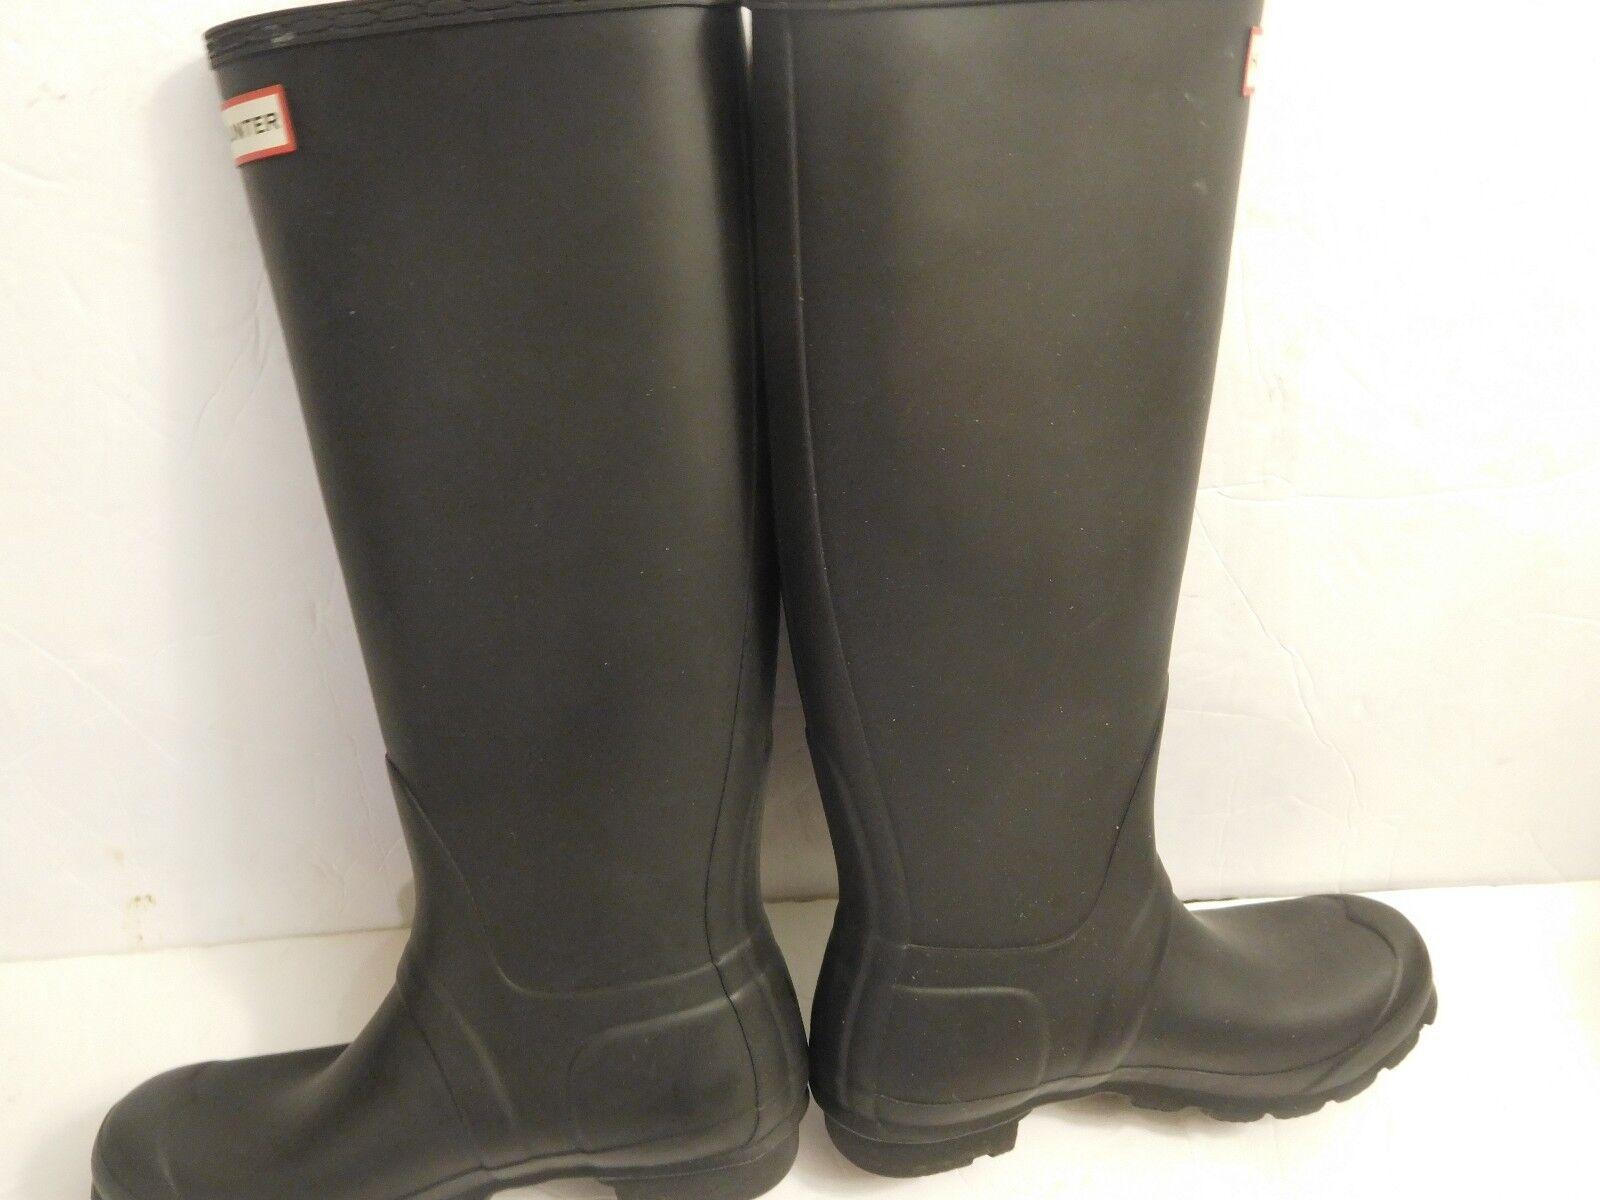 B-254 Hunter 'Original' Tall Rain Boot Matte Black (Women) Sz 6  150.00